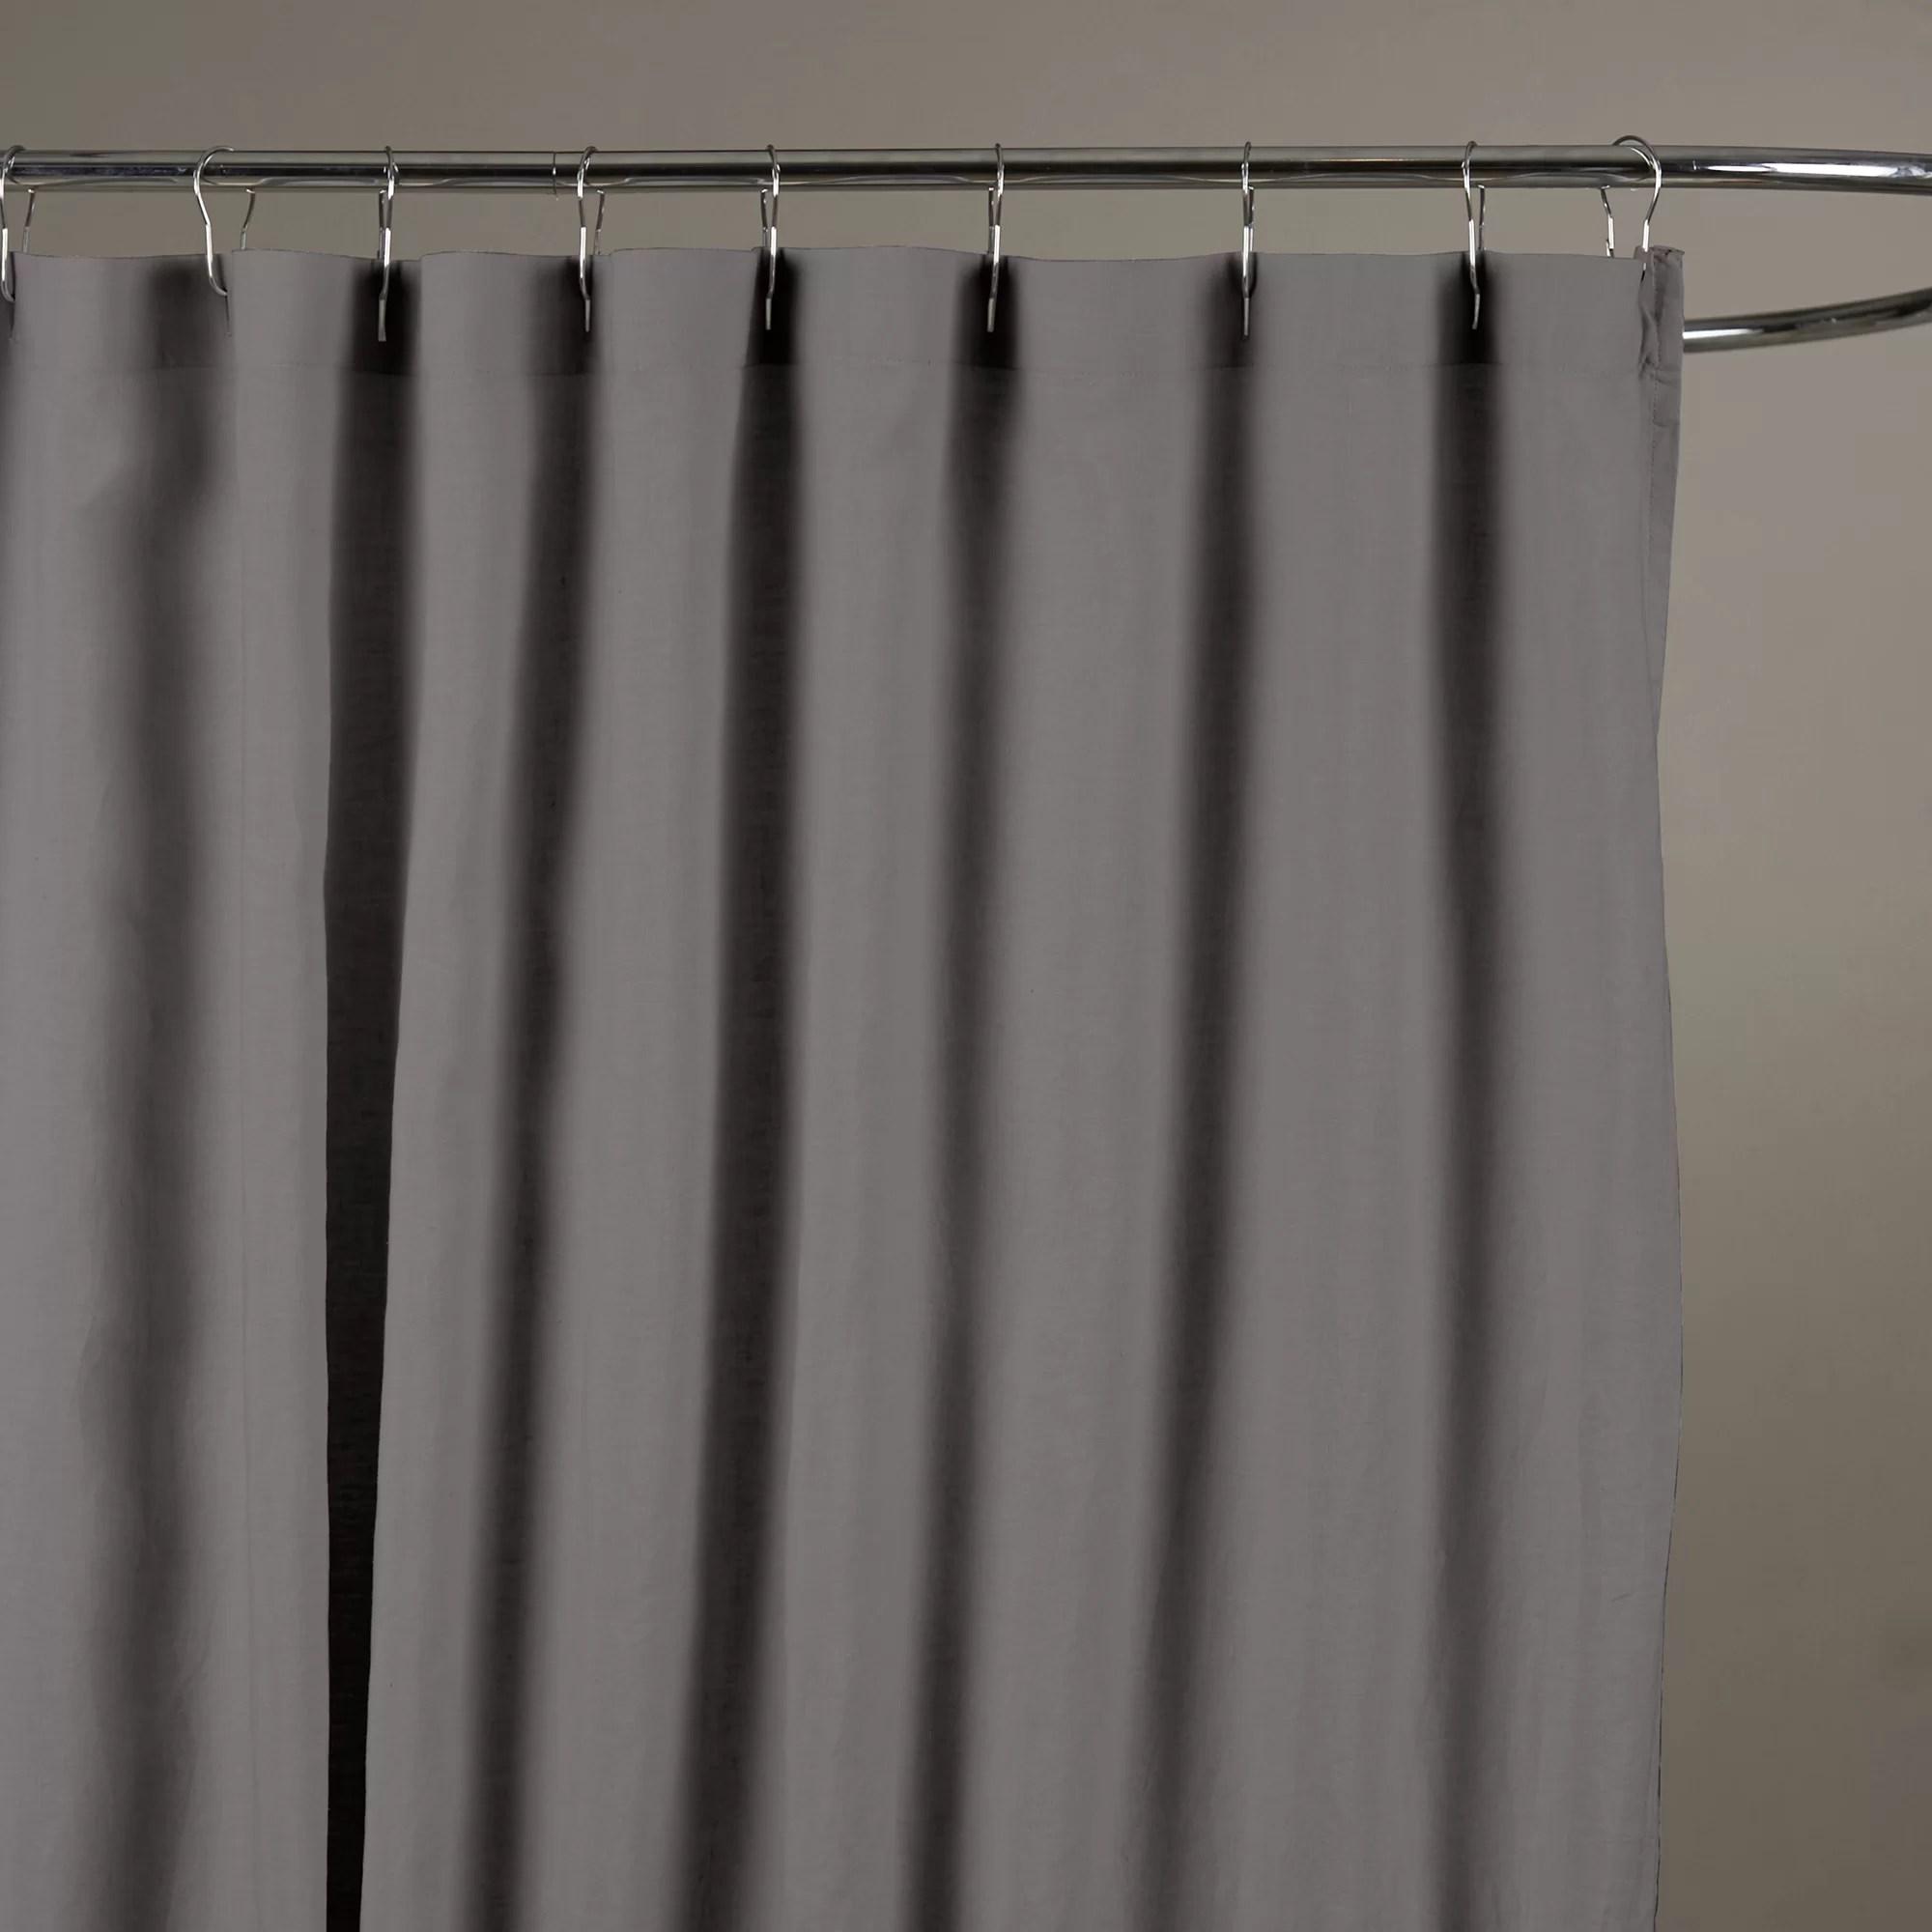 bernadette linen solid color single shower curtain